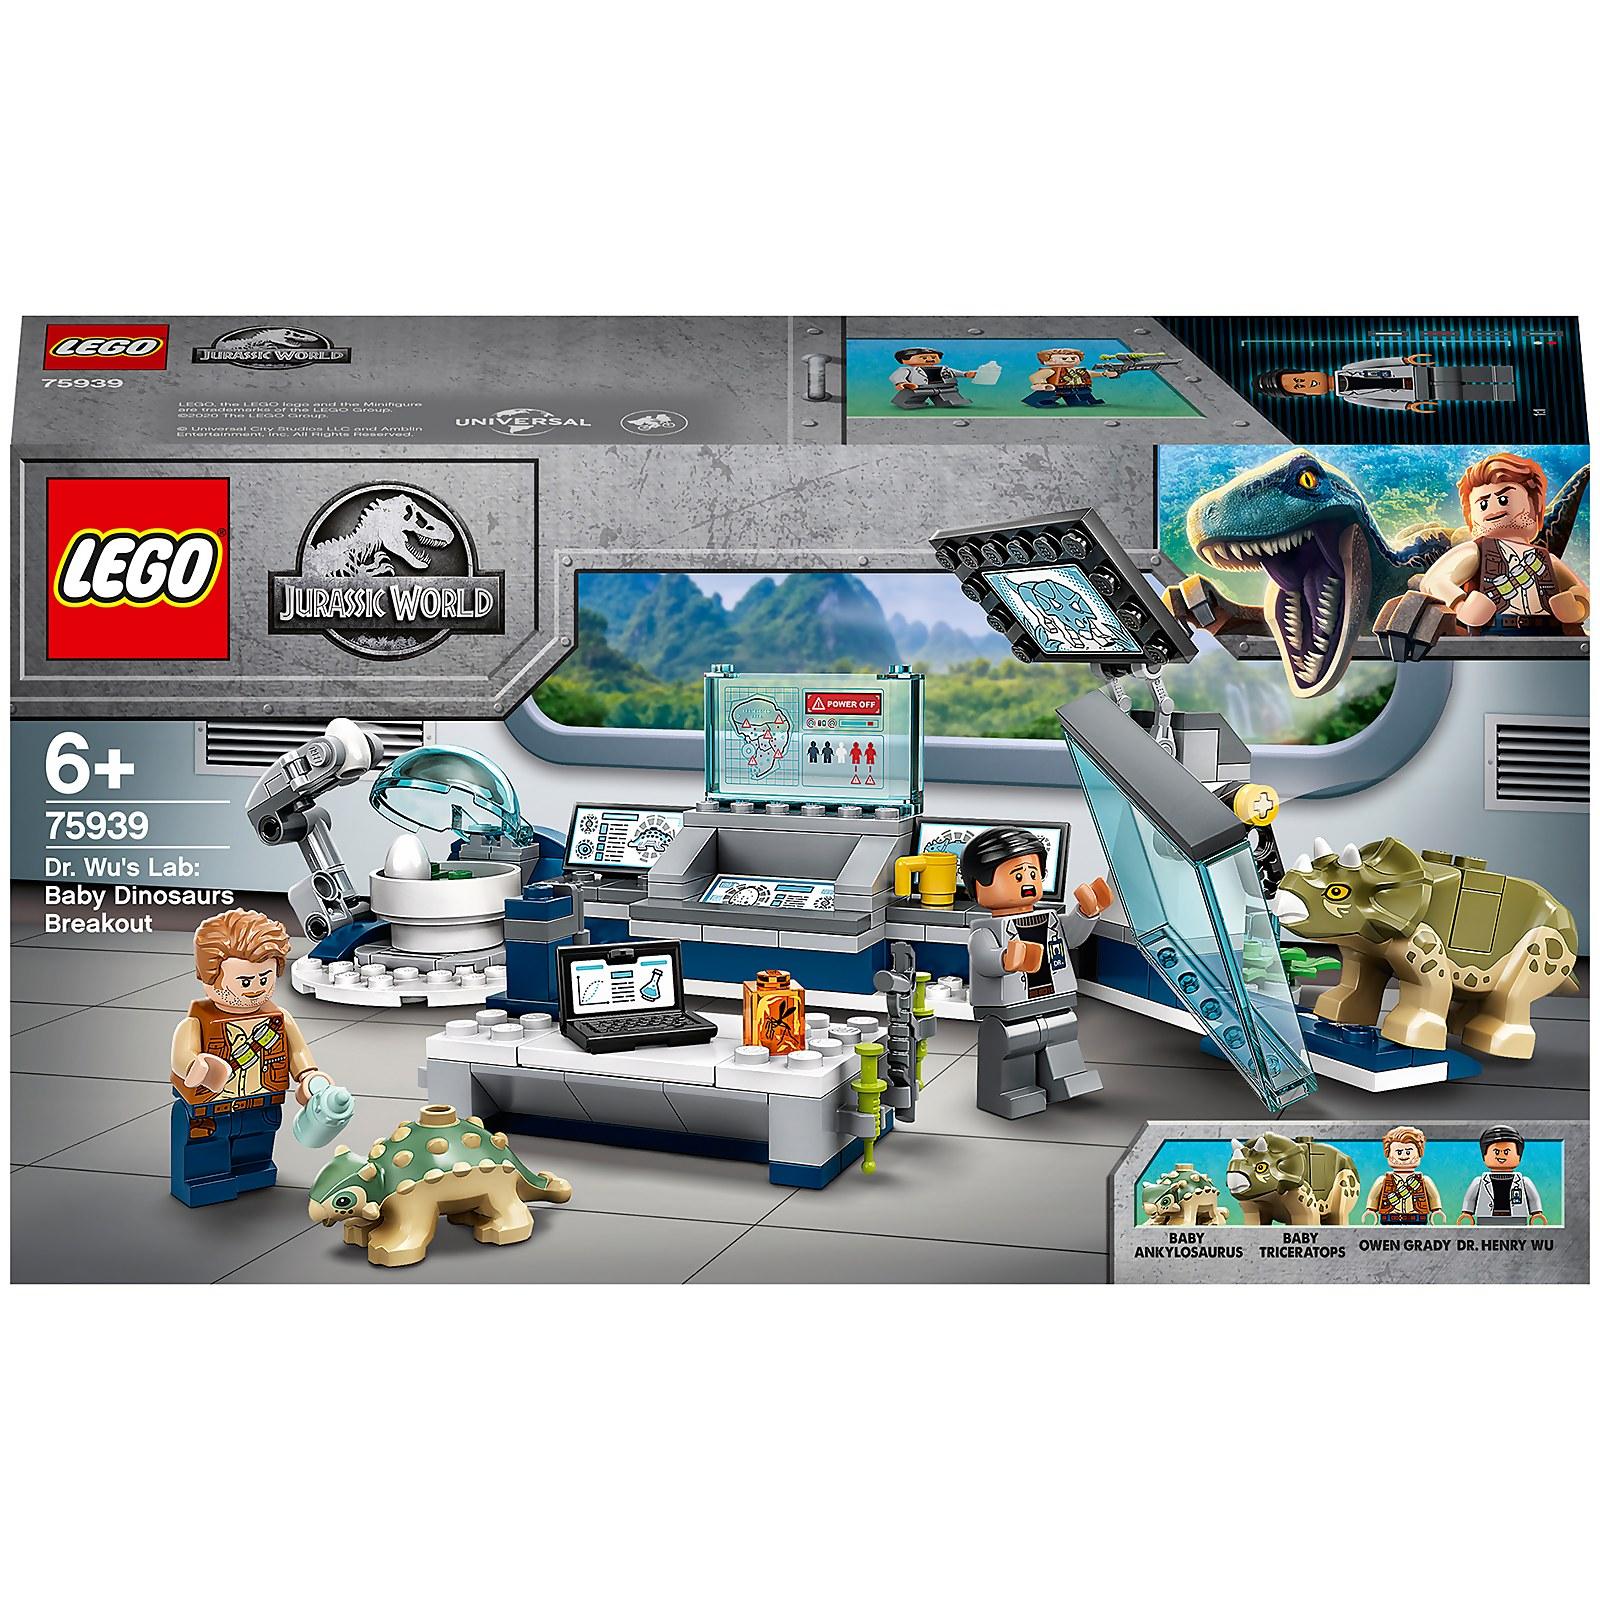 LEGO Jurassic World Baby Dinosaur Lab Breakout - 75939